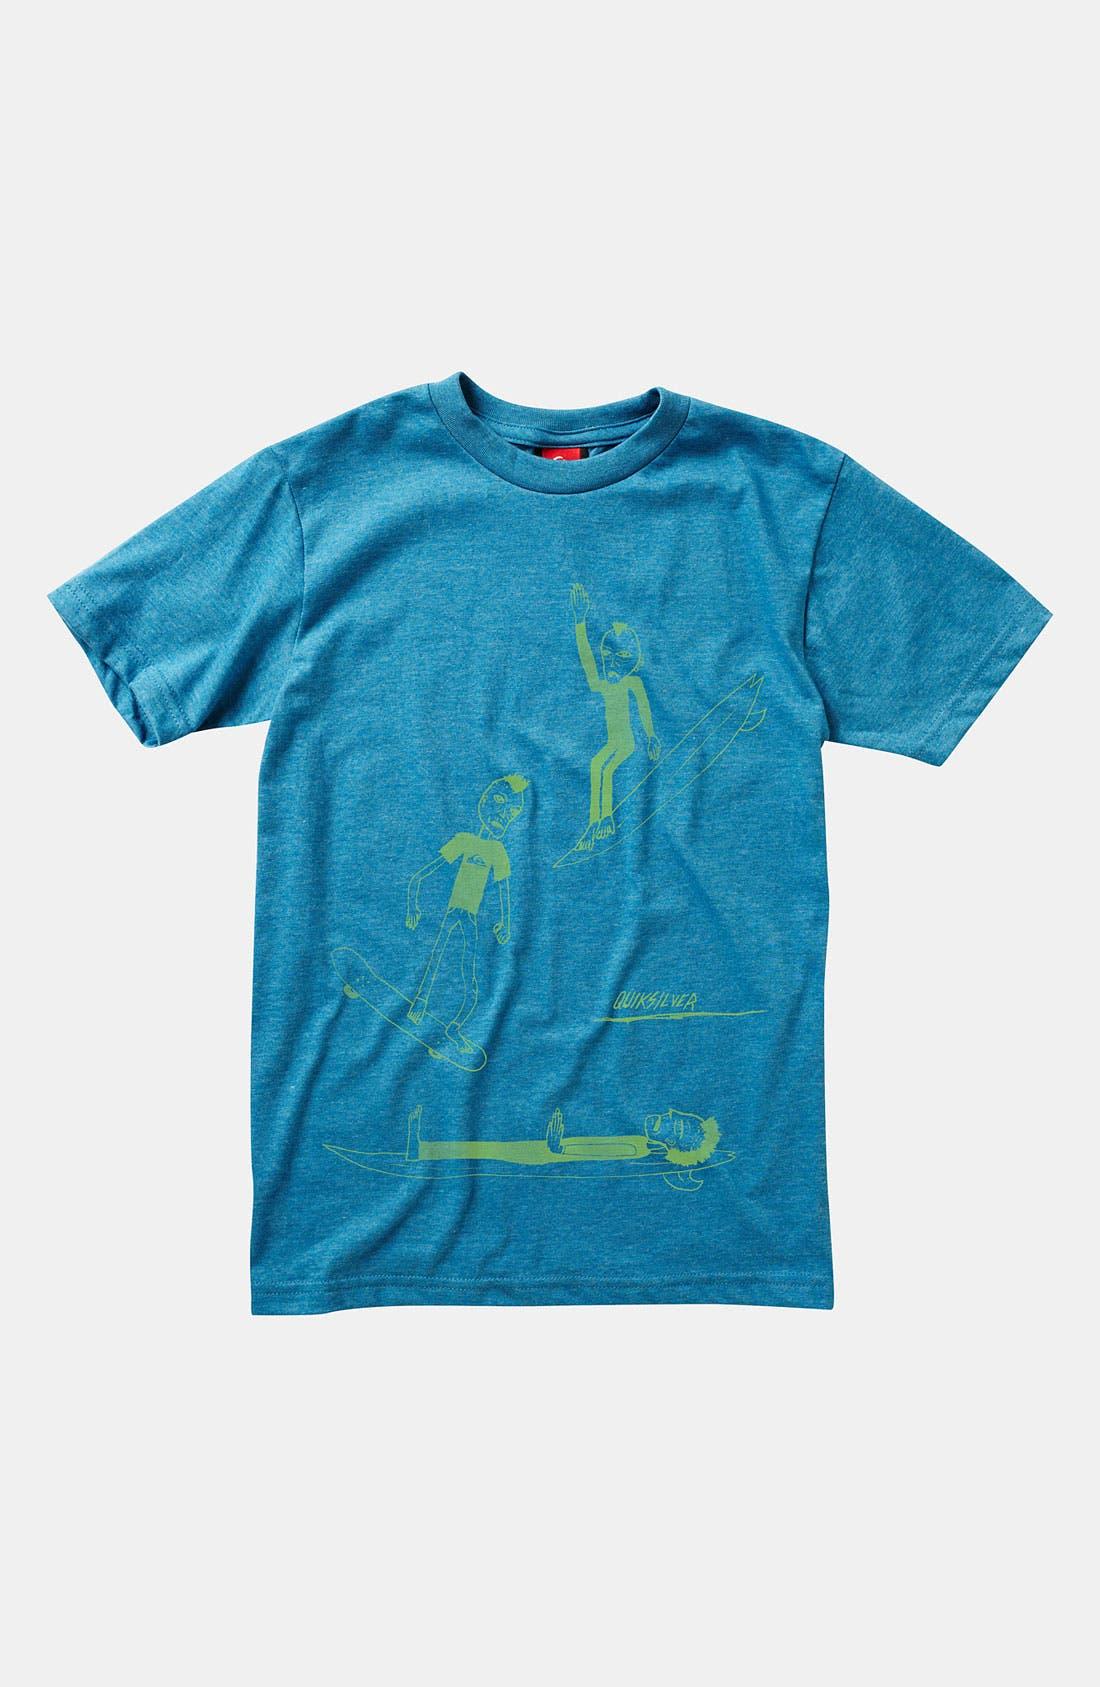 Main Image - Quiksilver 'Get Up' T-Shirt (Big Boys)